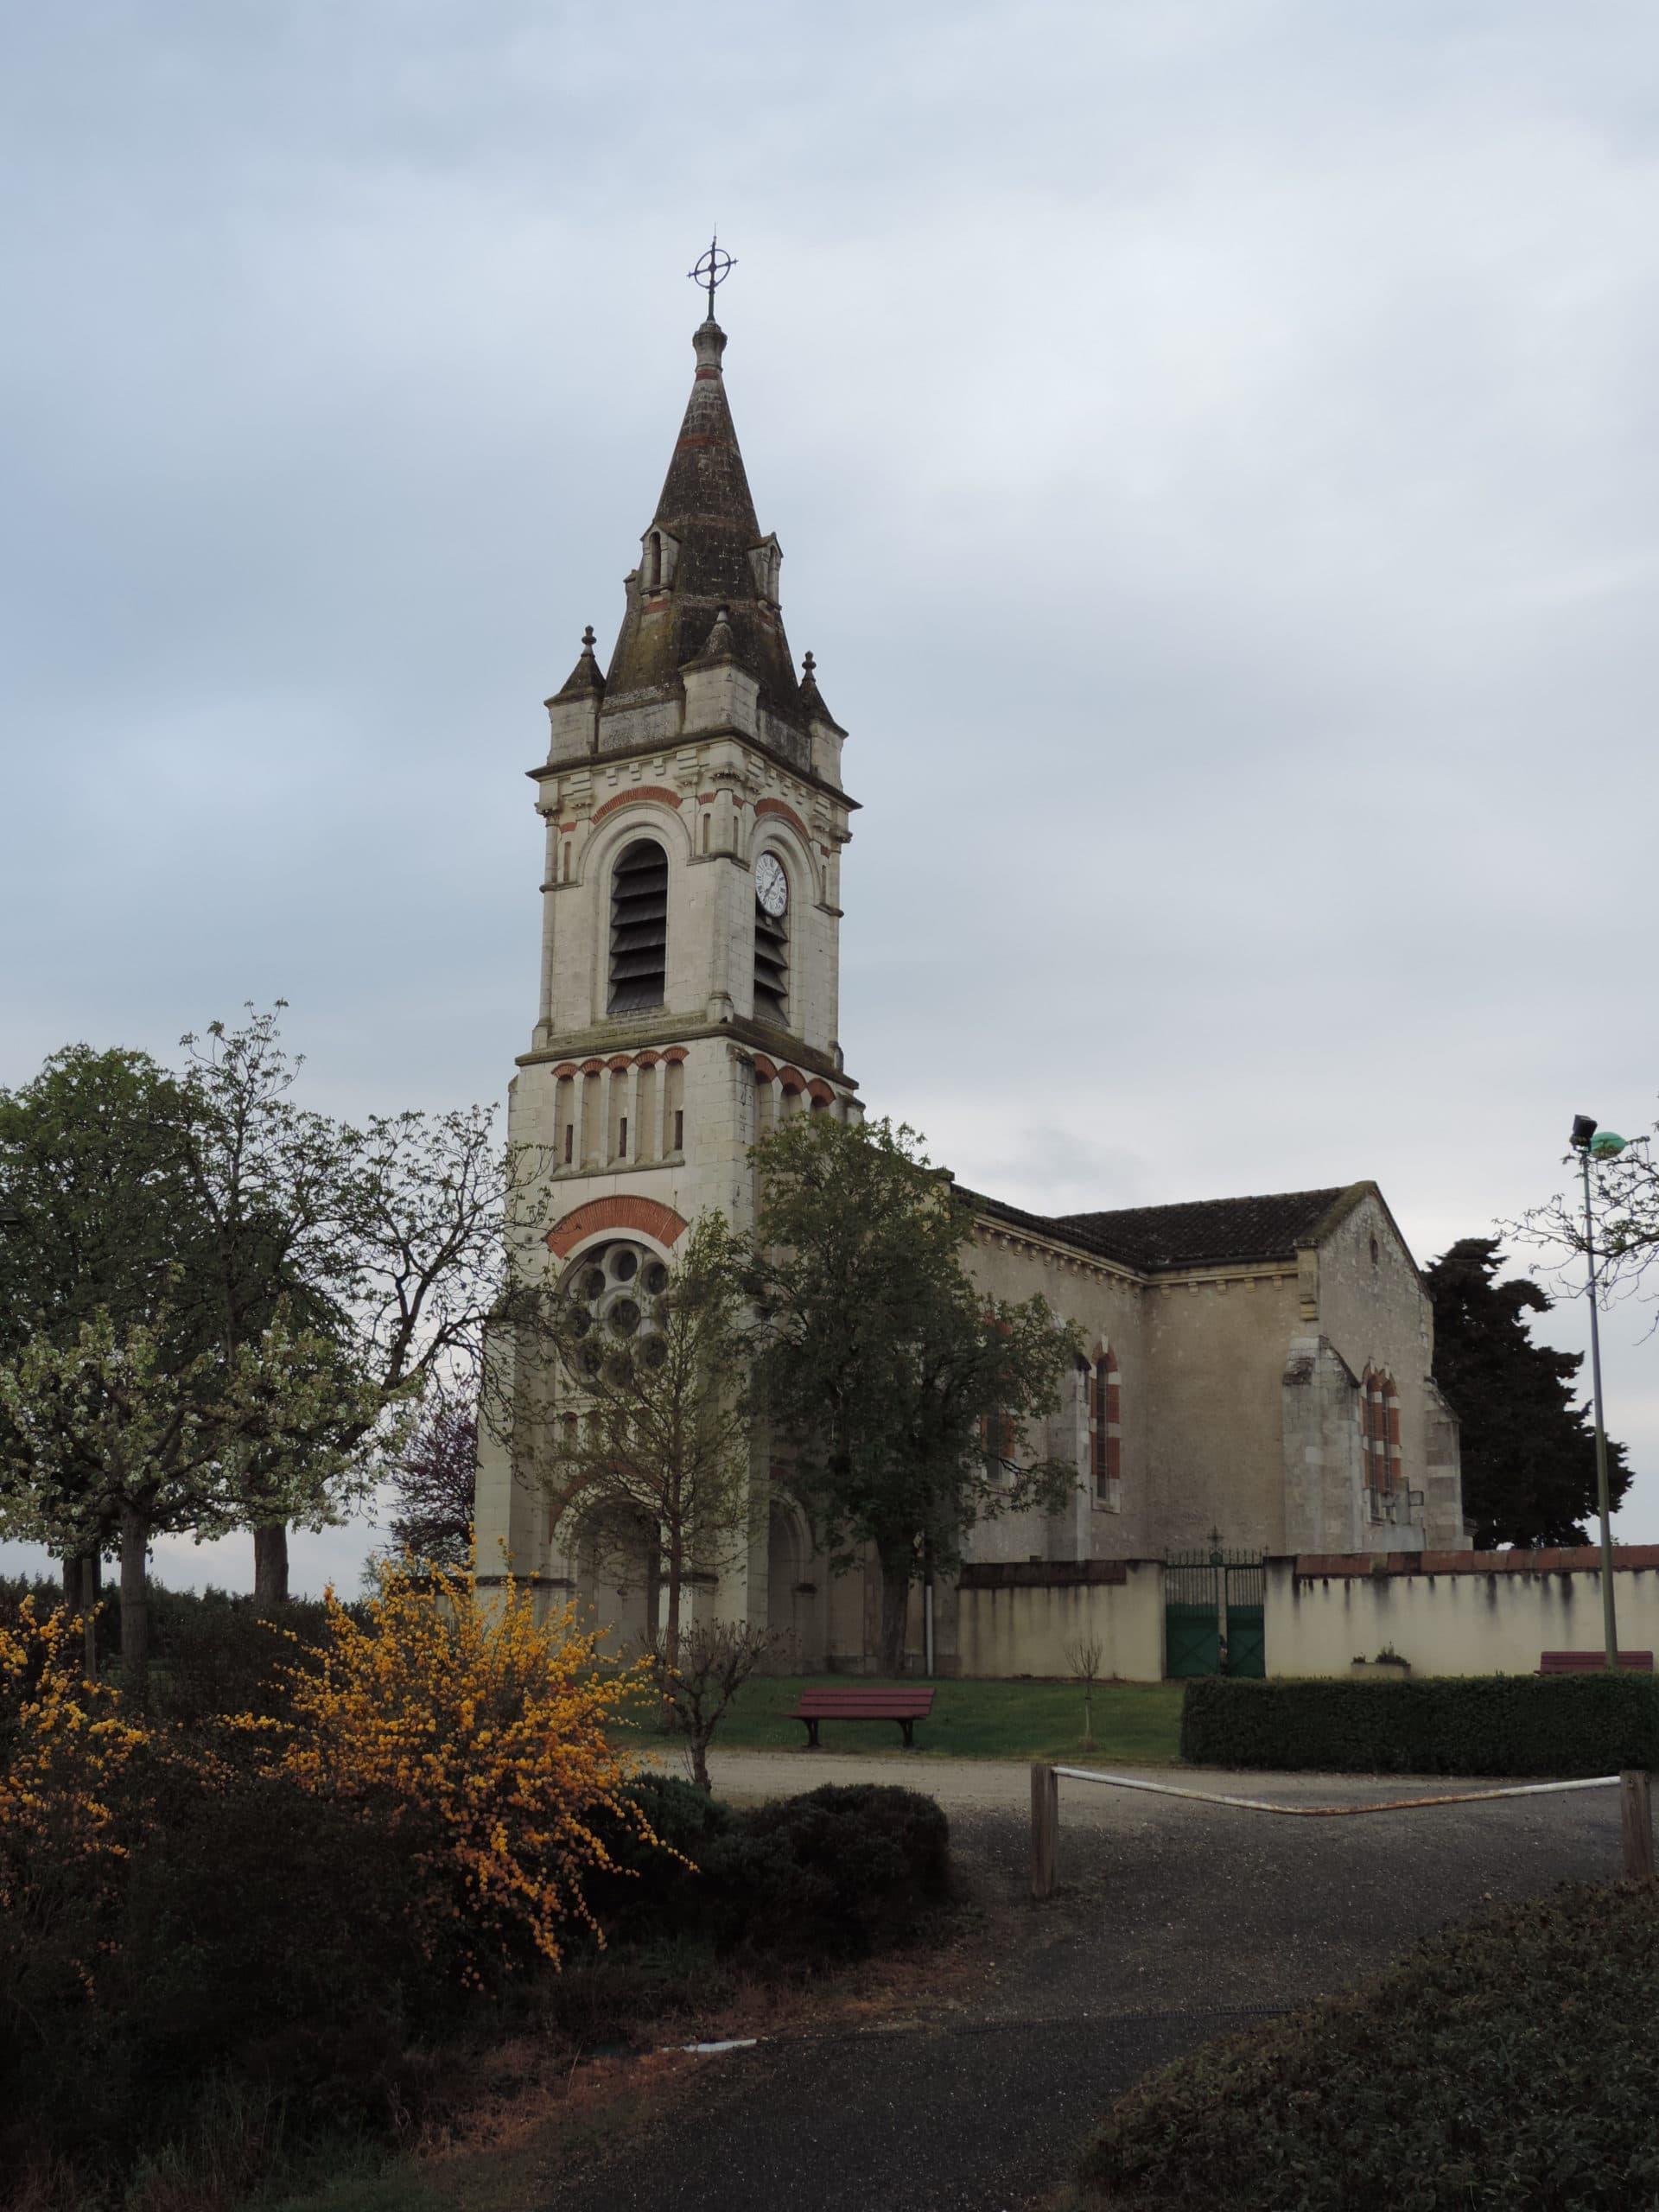 Le Riverain - Merles (Mèrles)